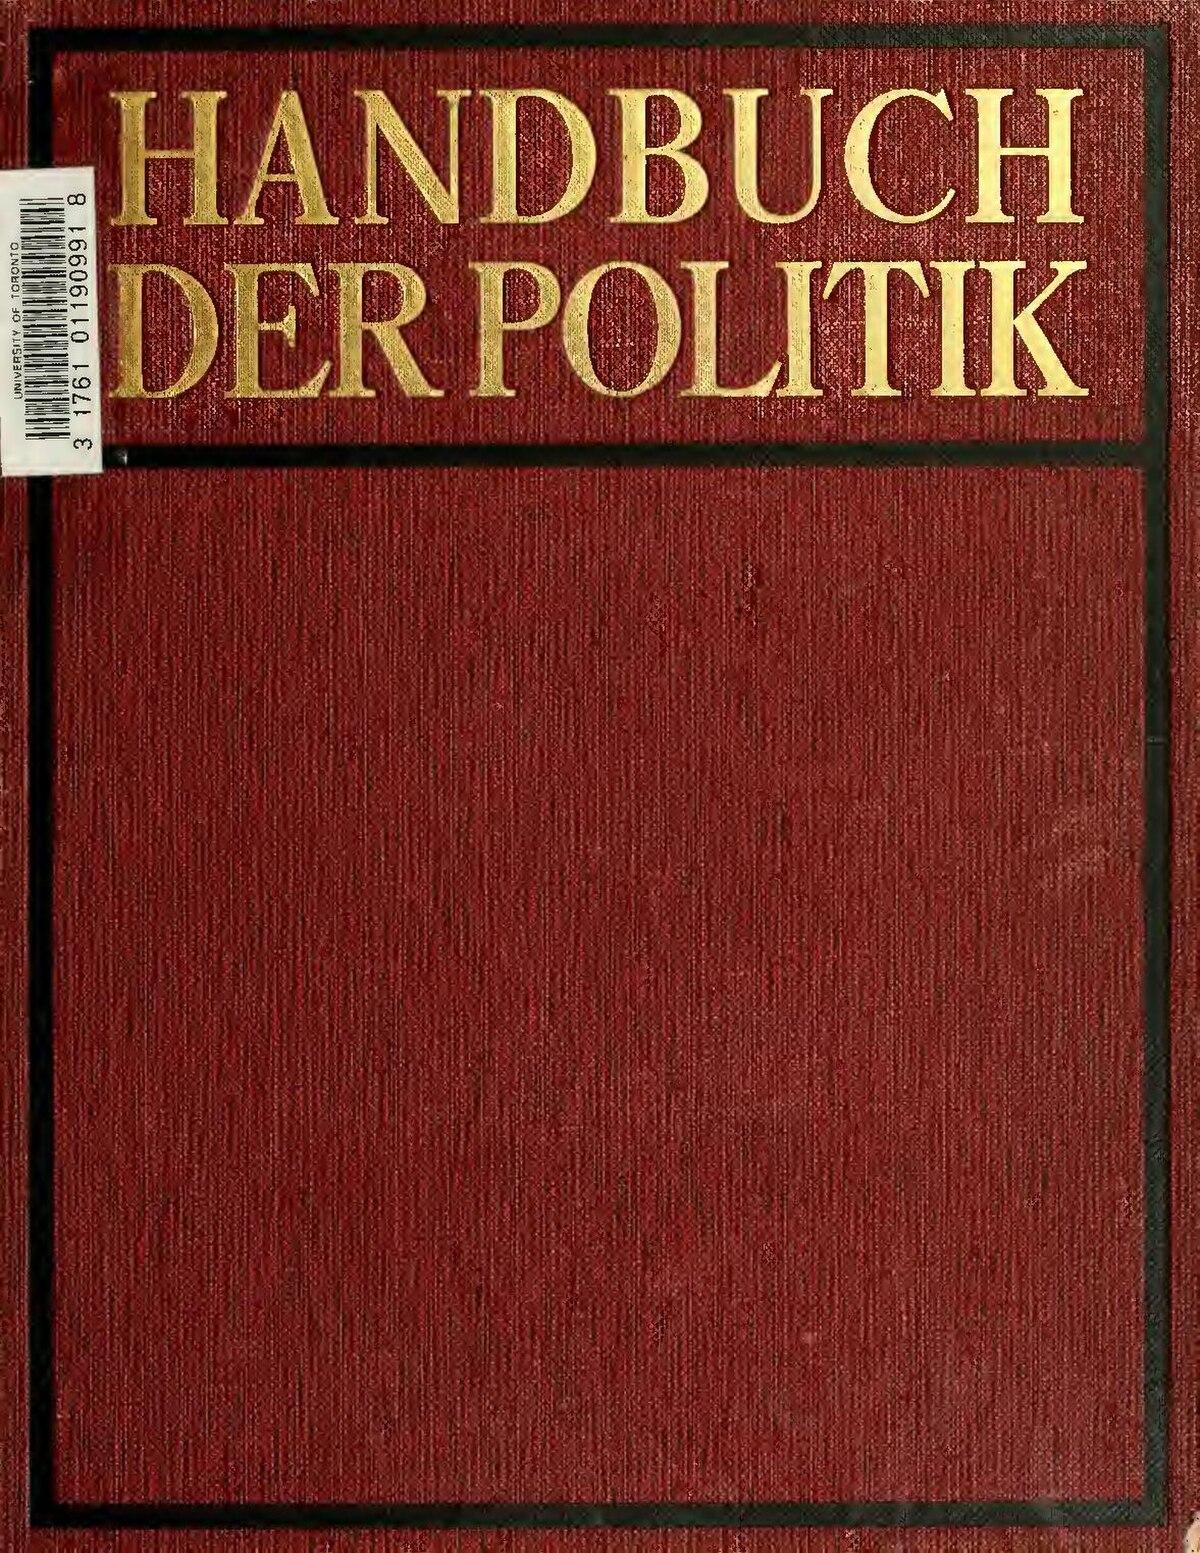 HeA-1 Handbuch. Teil 12G. Rustsatze - PDF Free Download